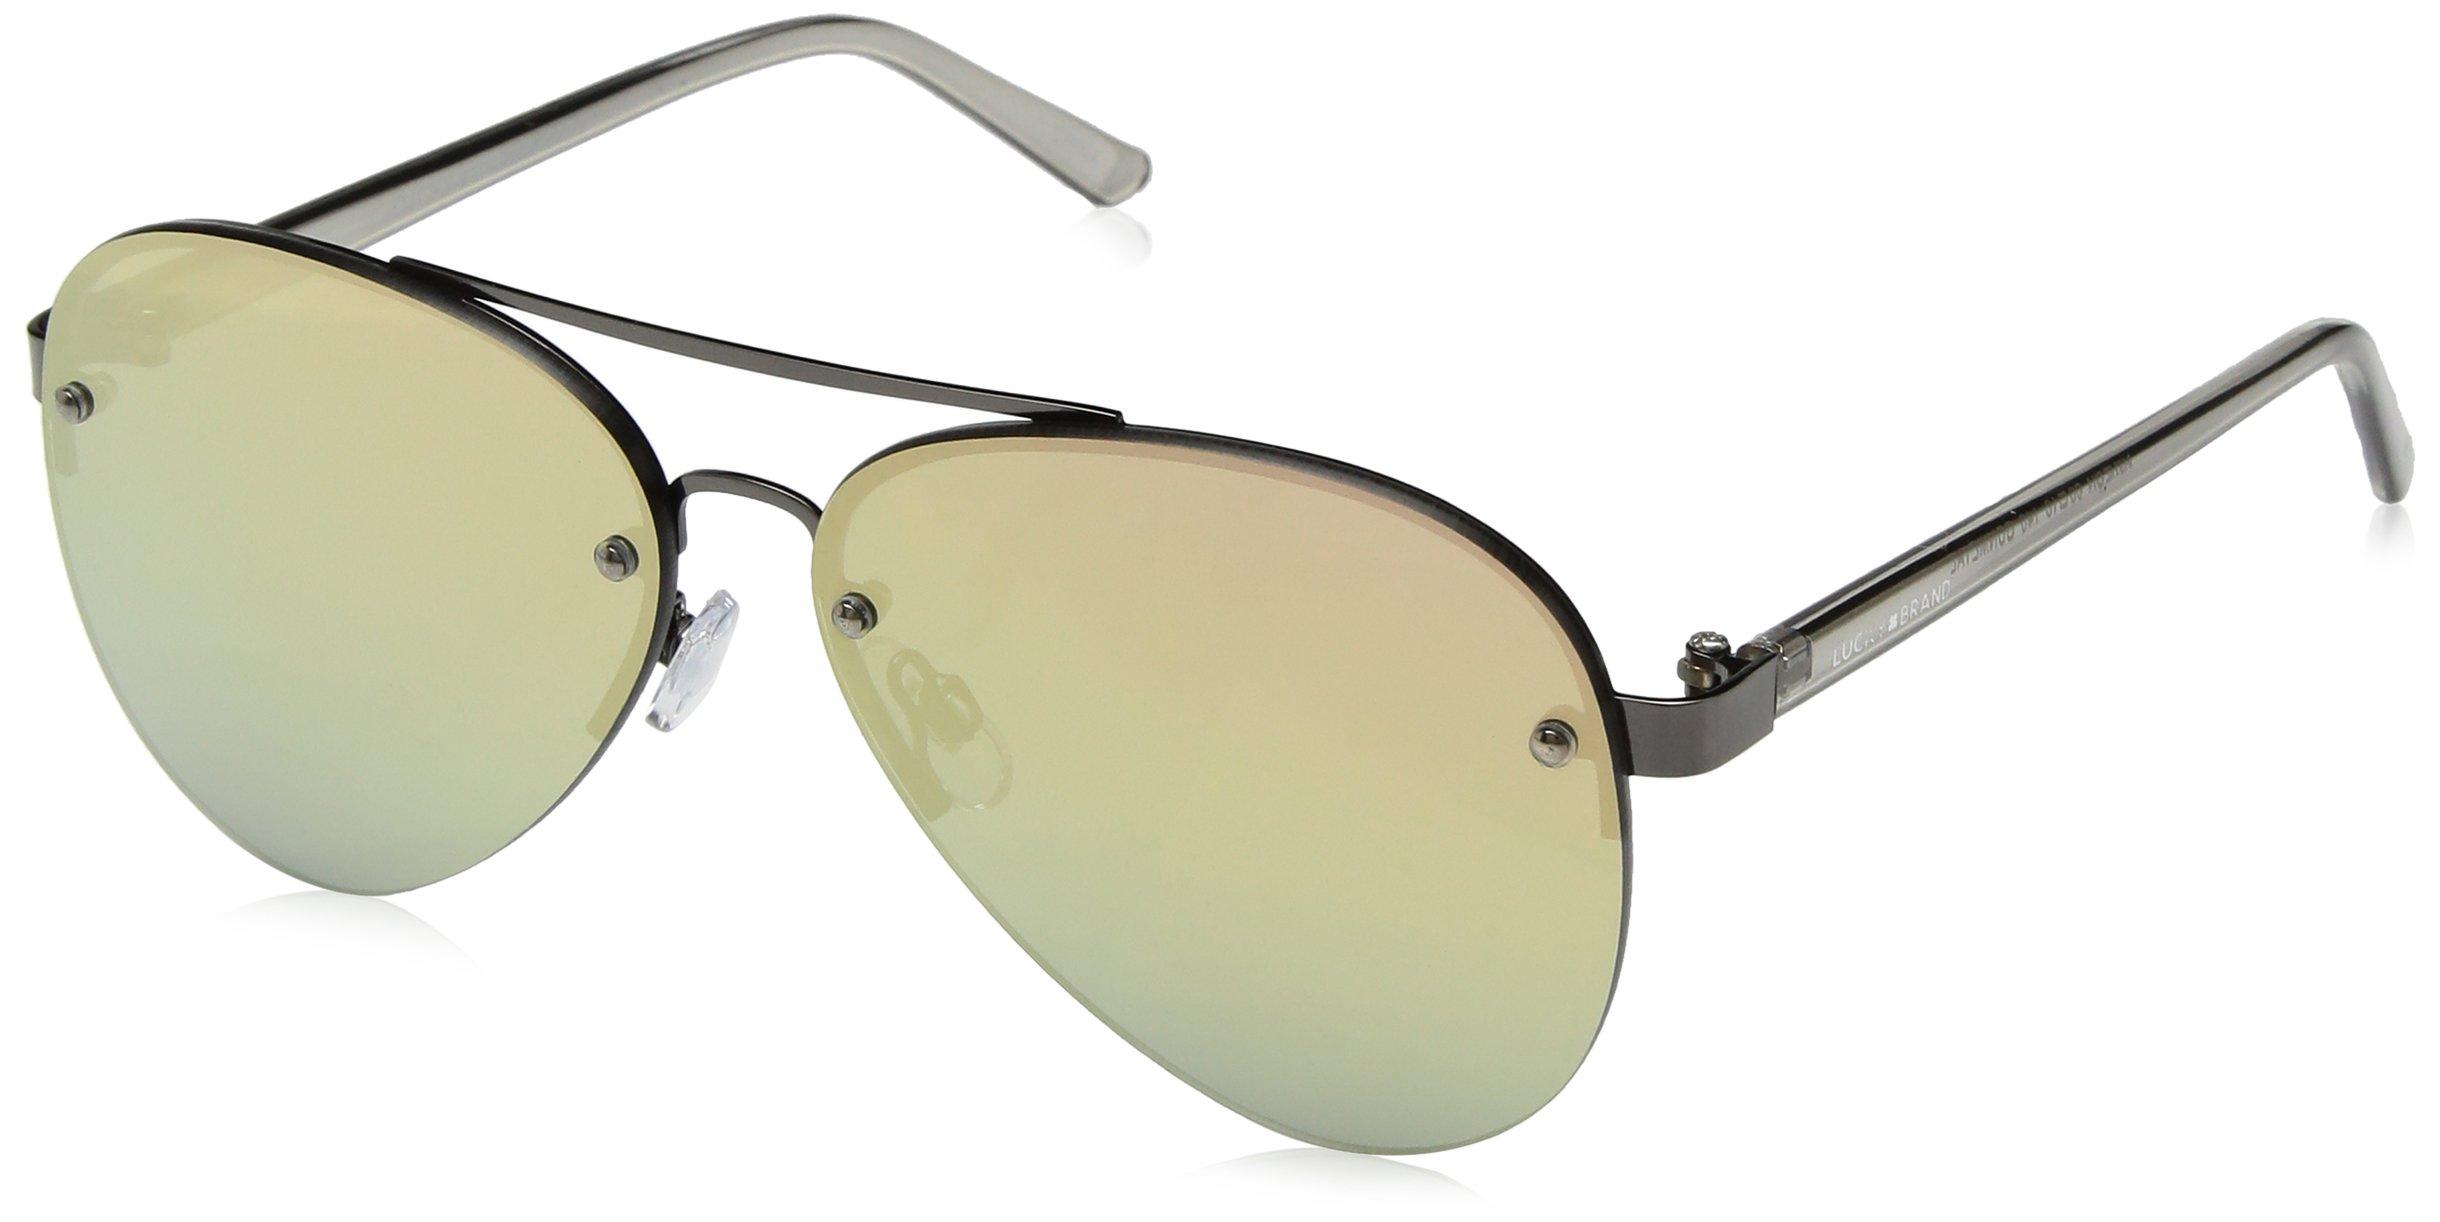 Lucky Avalgun65 Aviator Sunglasses, Gunmetal, 65 mm